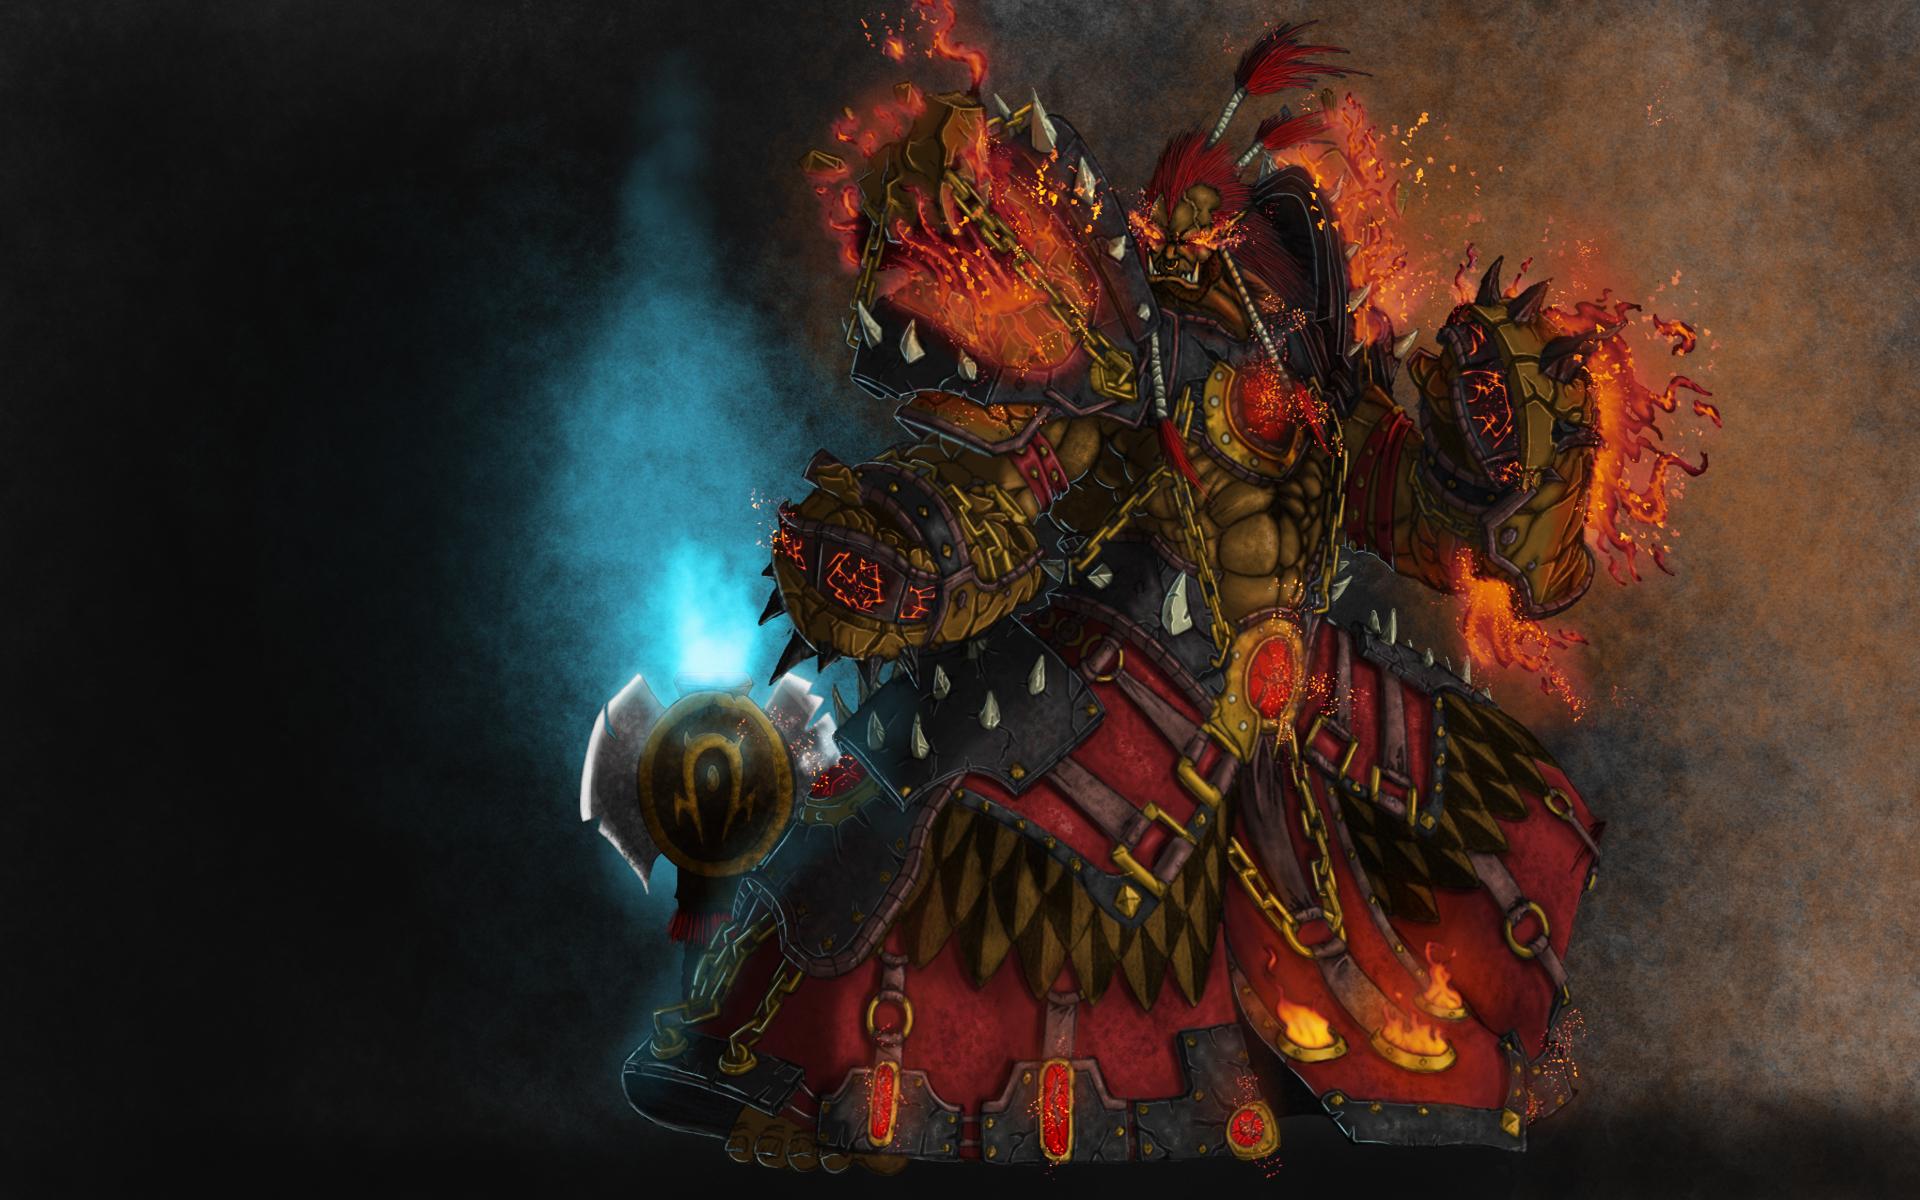 Fondos De Pantalla 1920x1200 World Of Warcraft Magia Monstruos